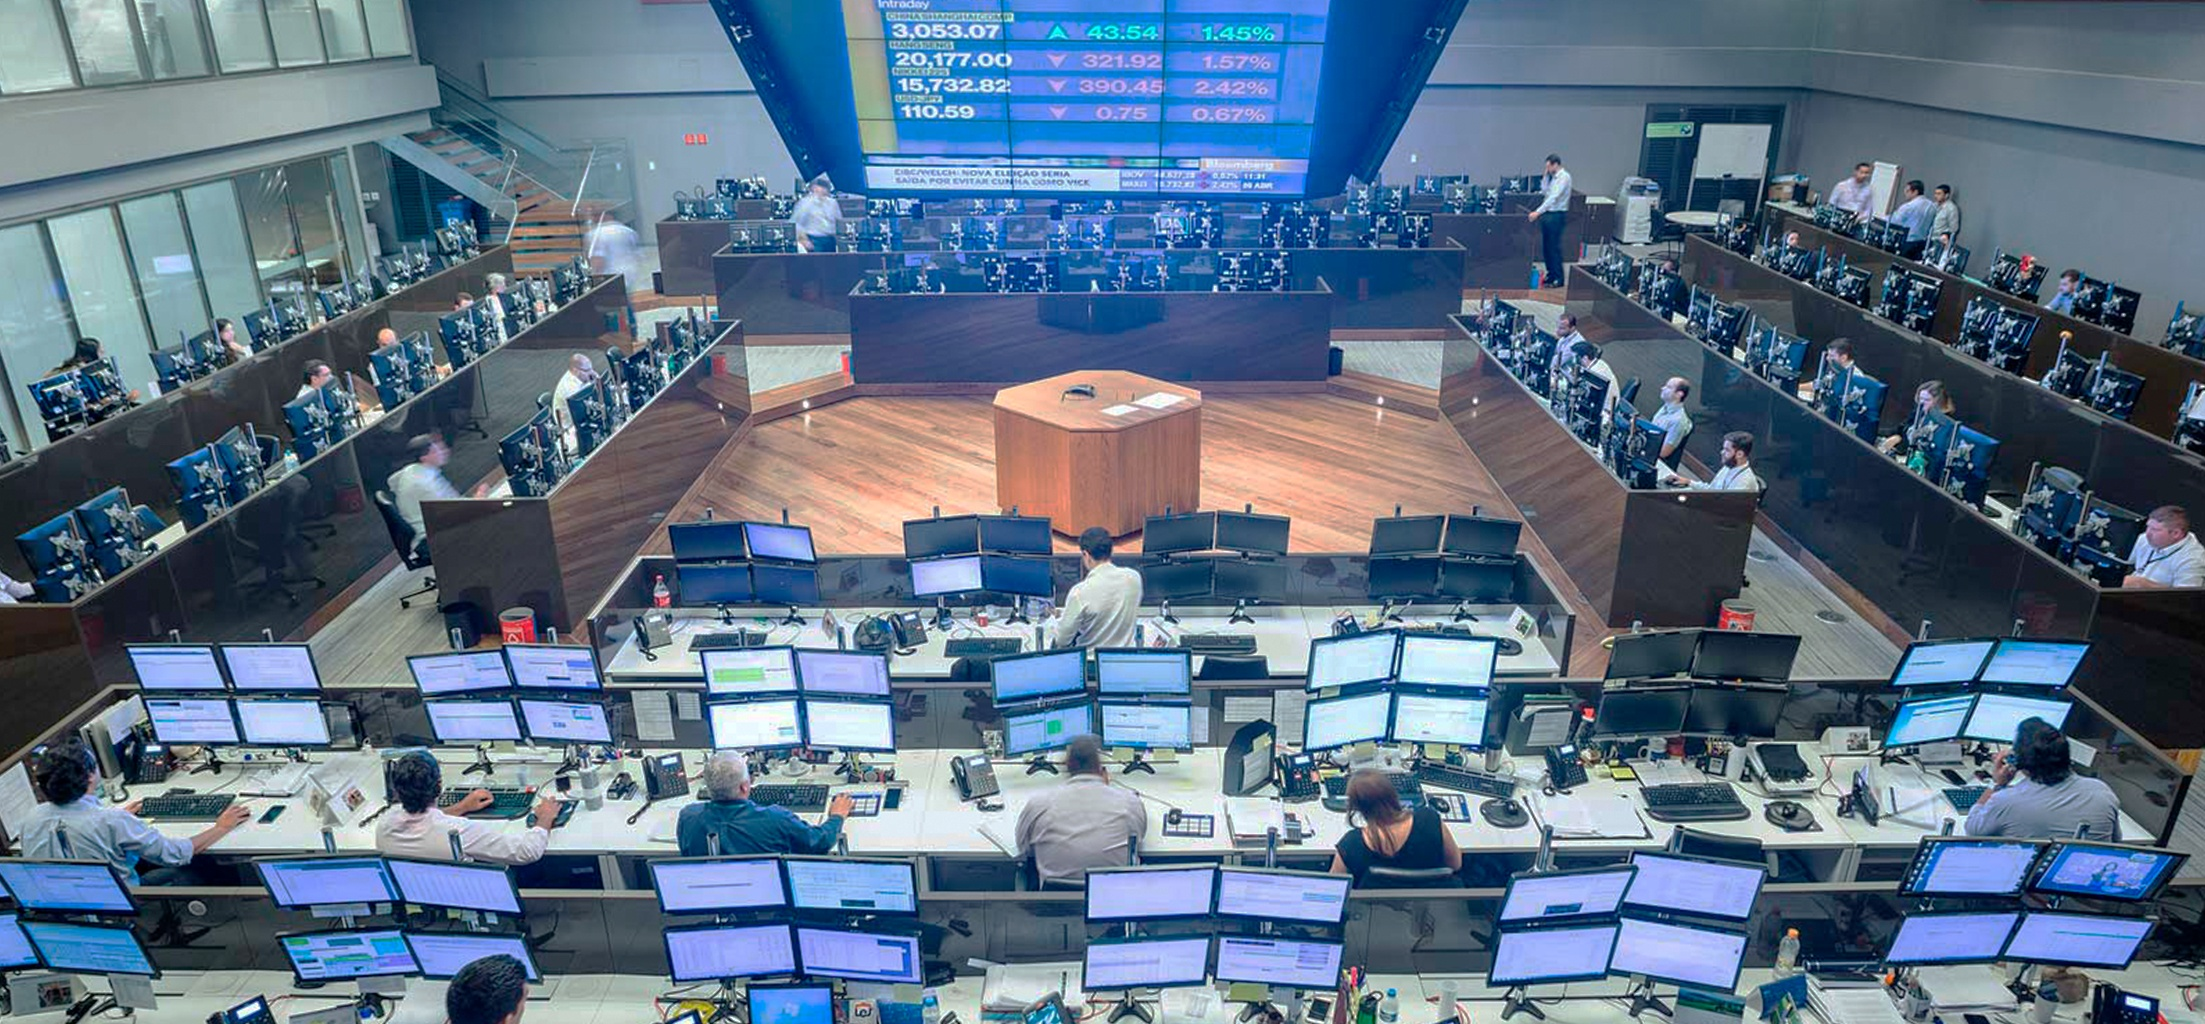 Como-funciona-a-Bolsa-de-Valores-no-Brasil